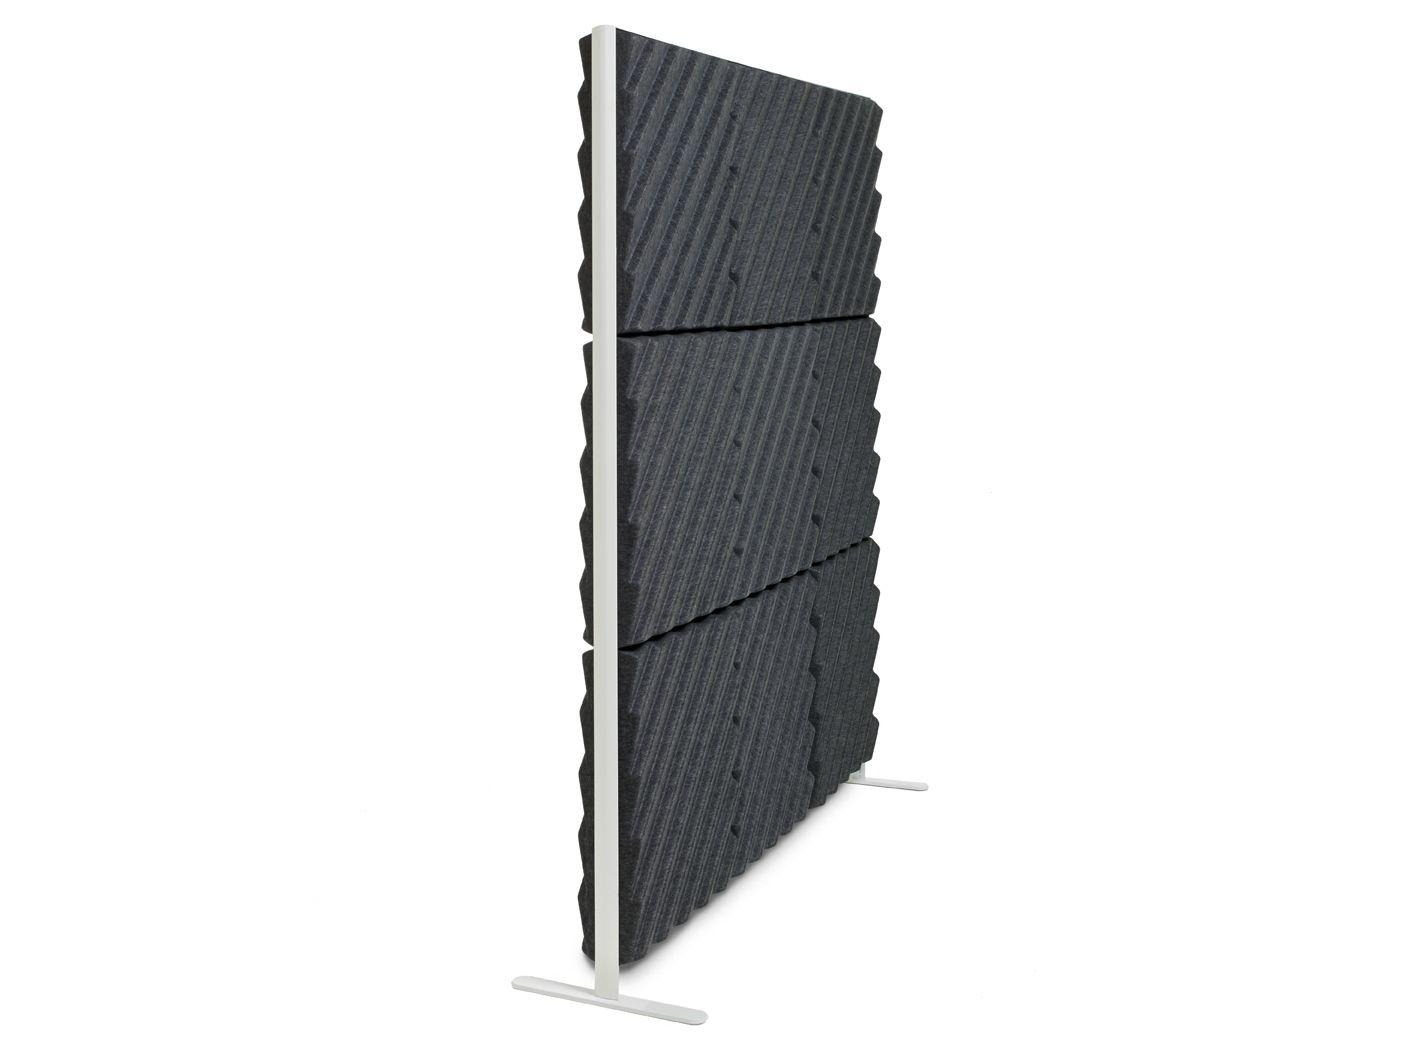 panneau isolation acoustique awesome wonderful panneau isolation phonique exterieure isolation. Black Bedroom Furniture Sets. Home Design Ideas